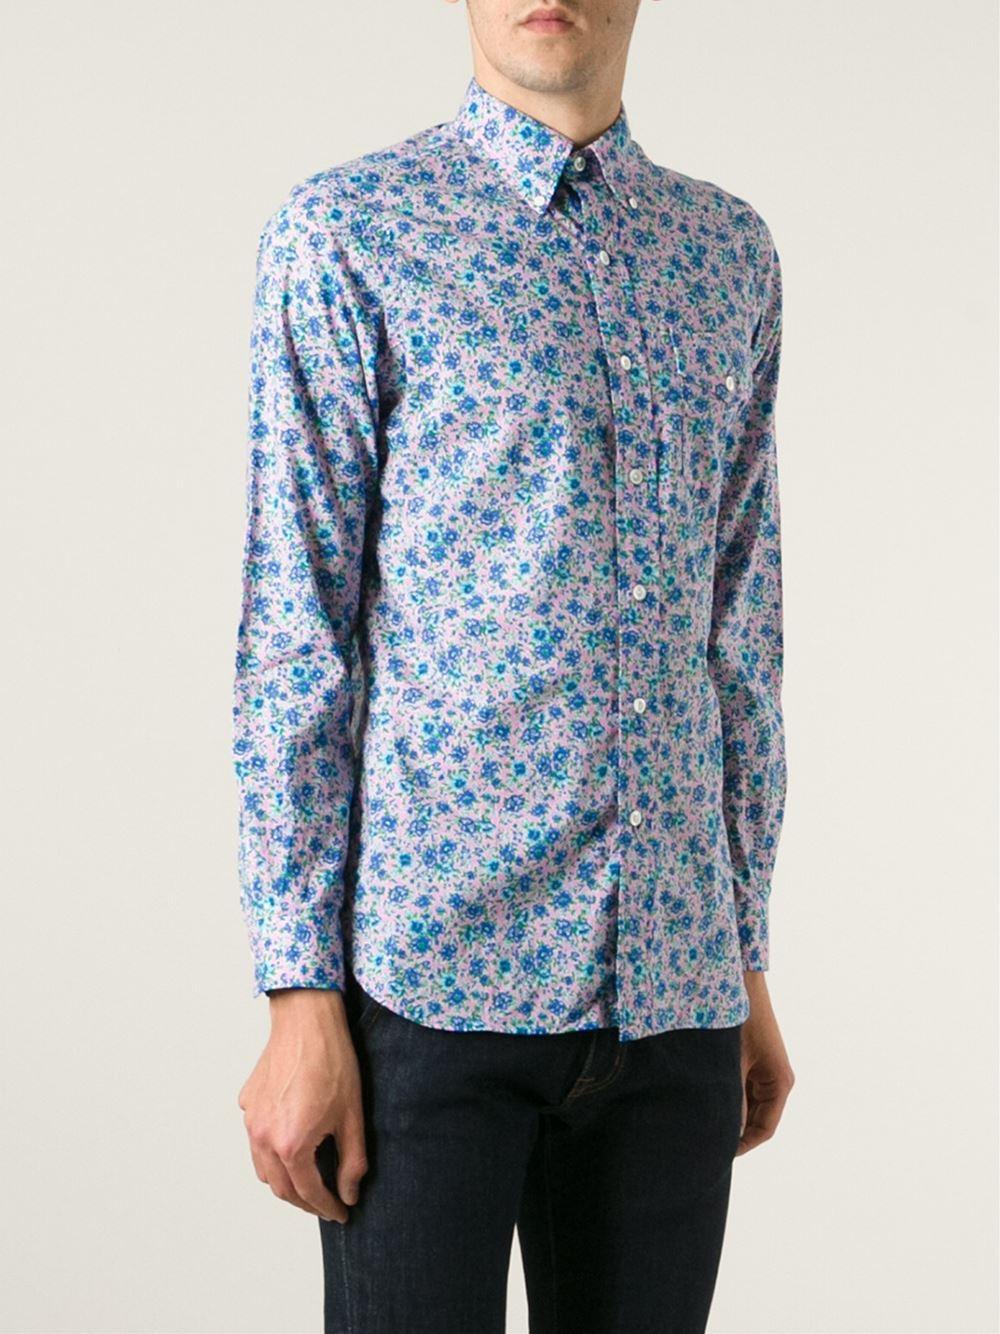 Polo ralph lauren floral print button down shirt in blue for Polo ralph lauren casual button down shirts